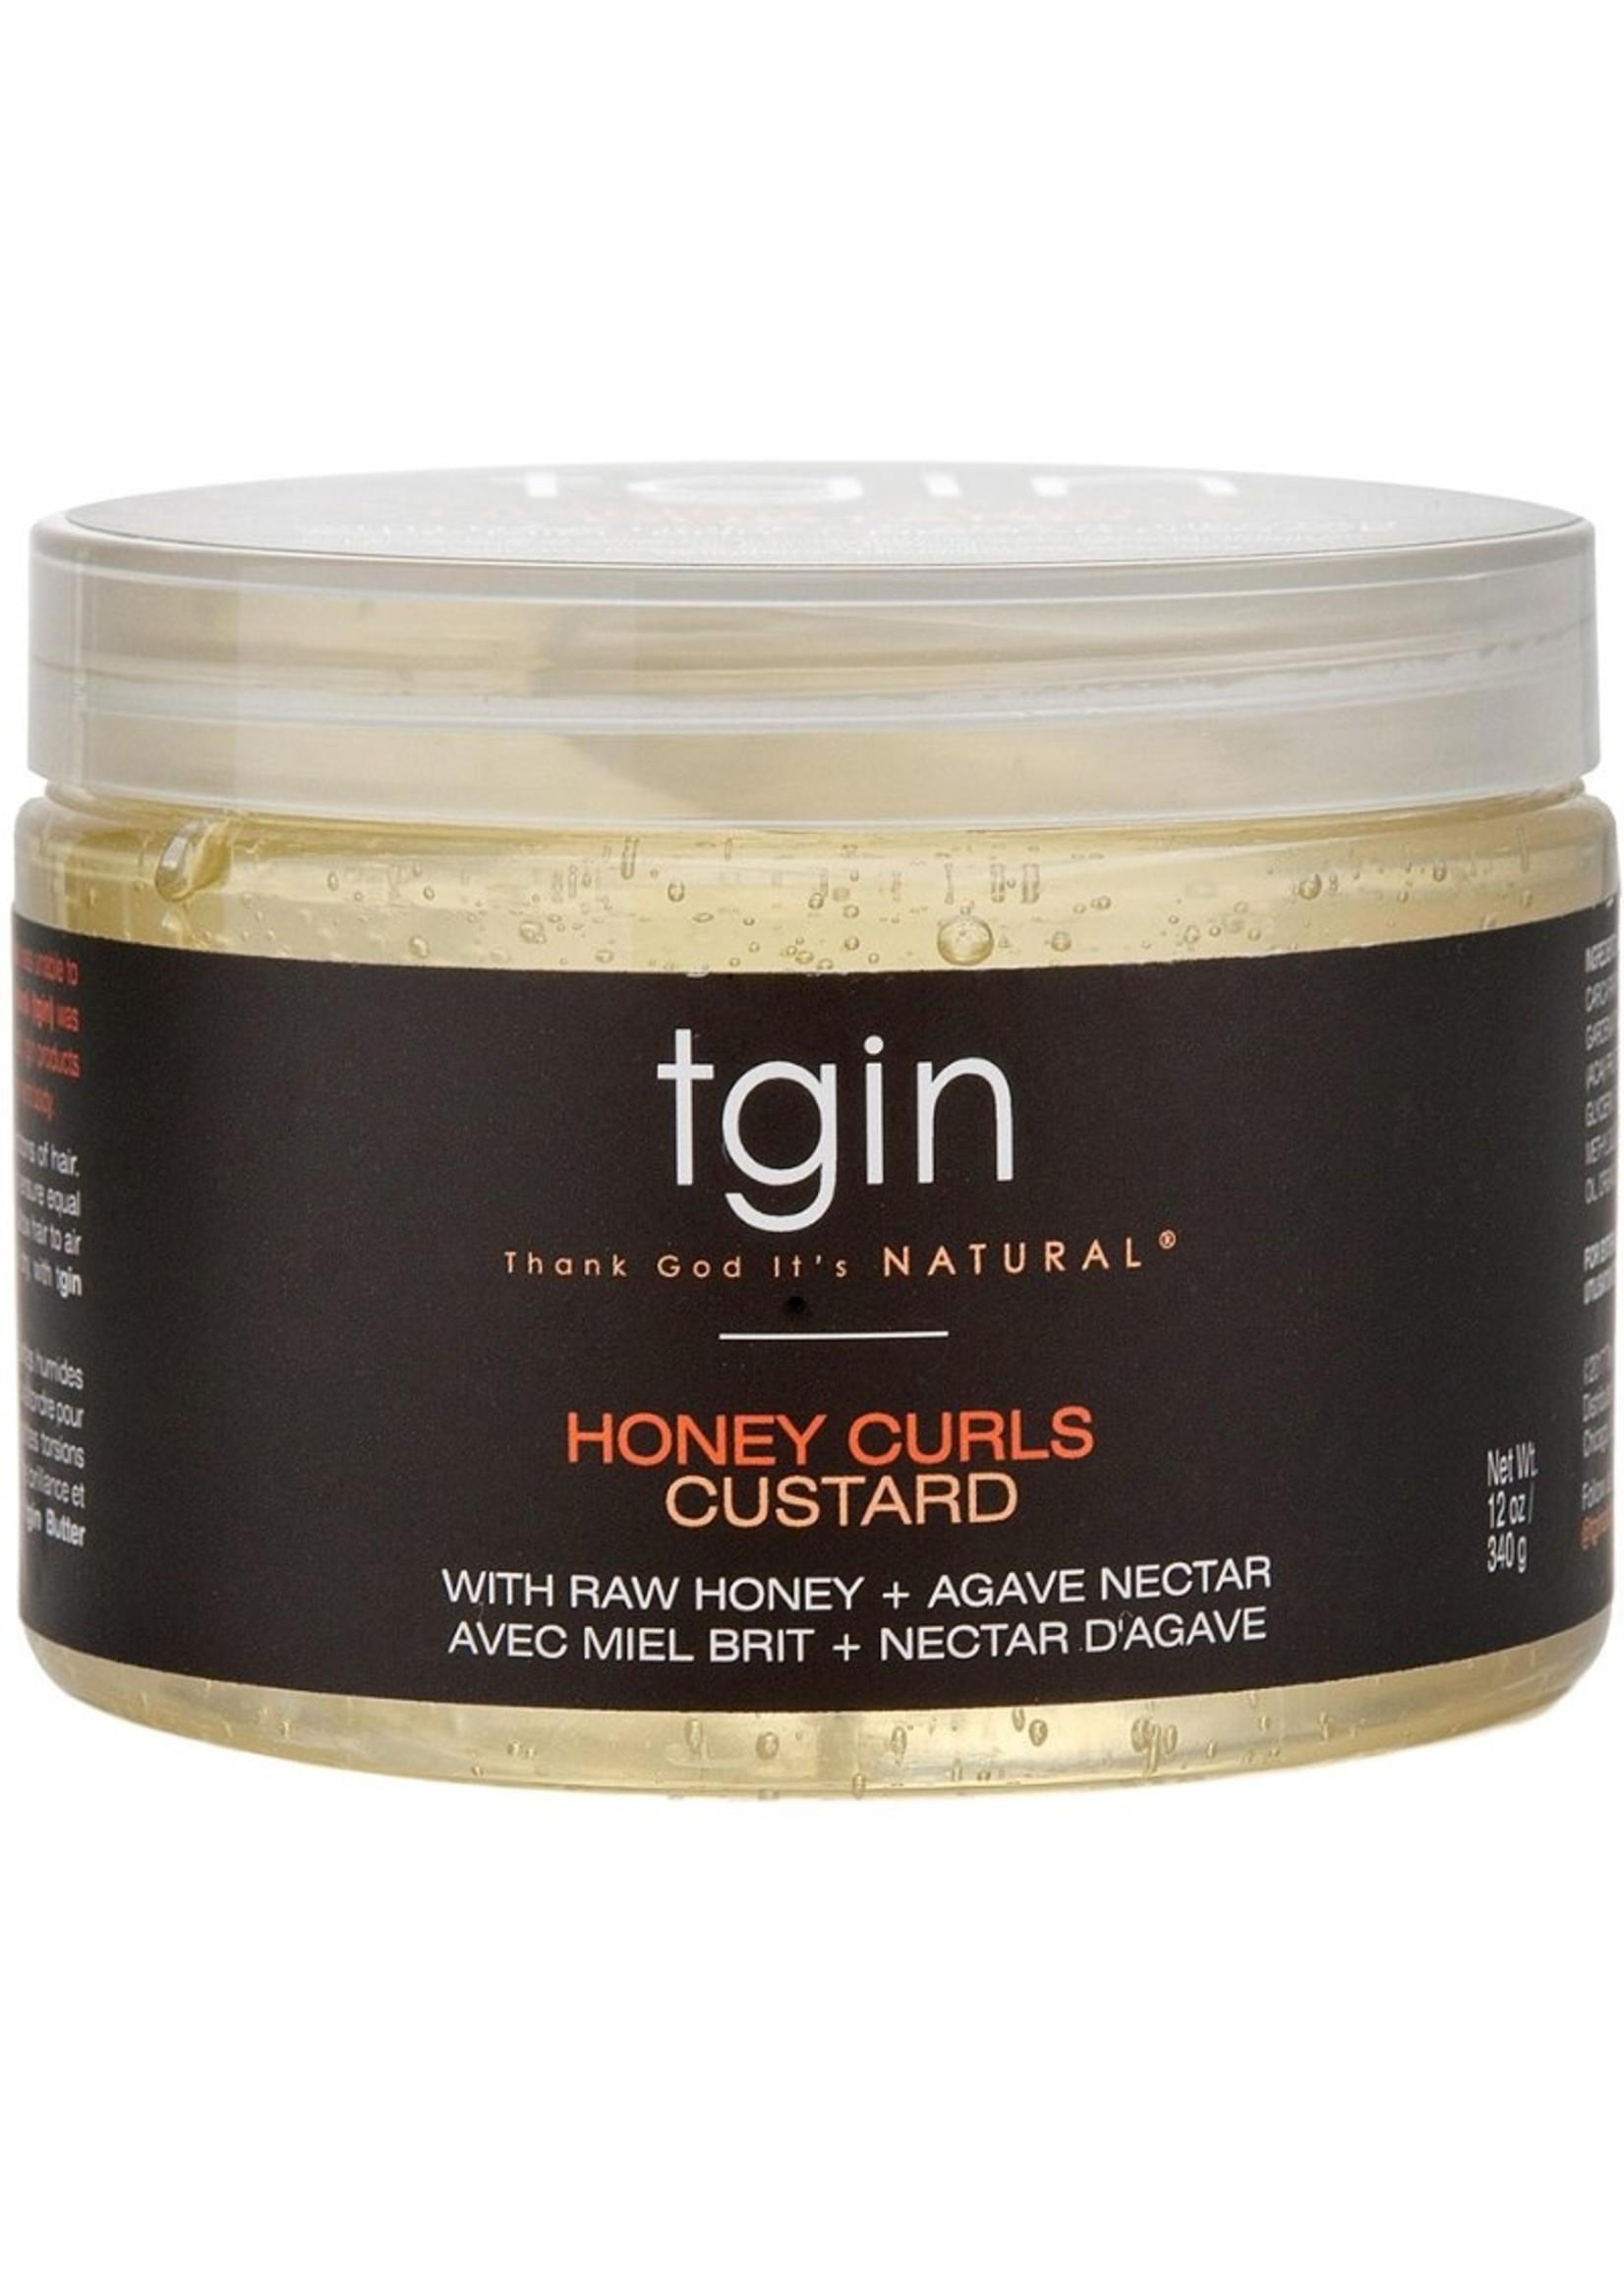 TGIN Honey Curls Custard